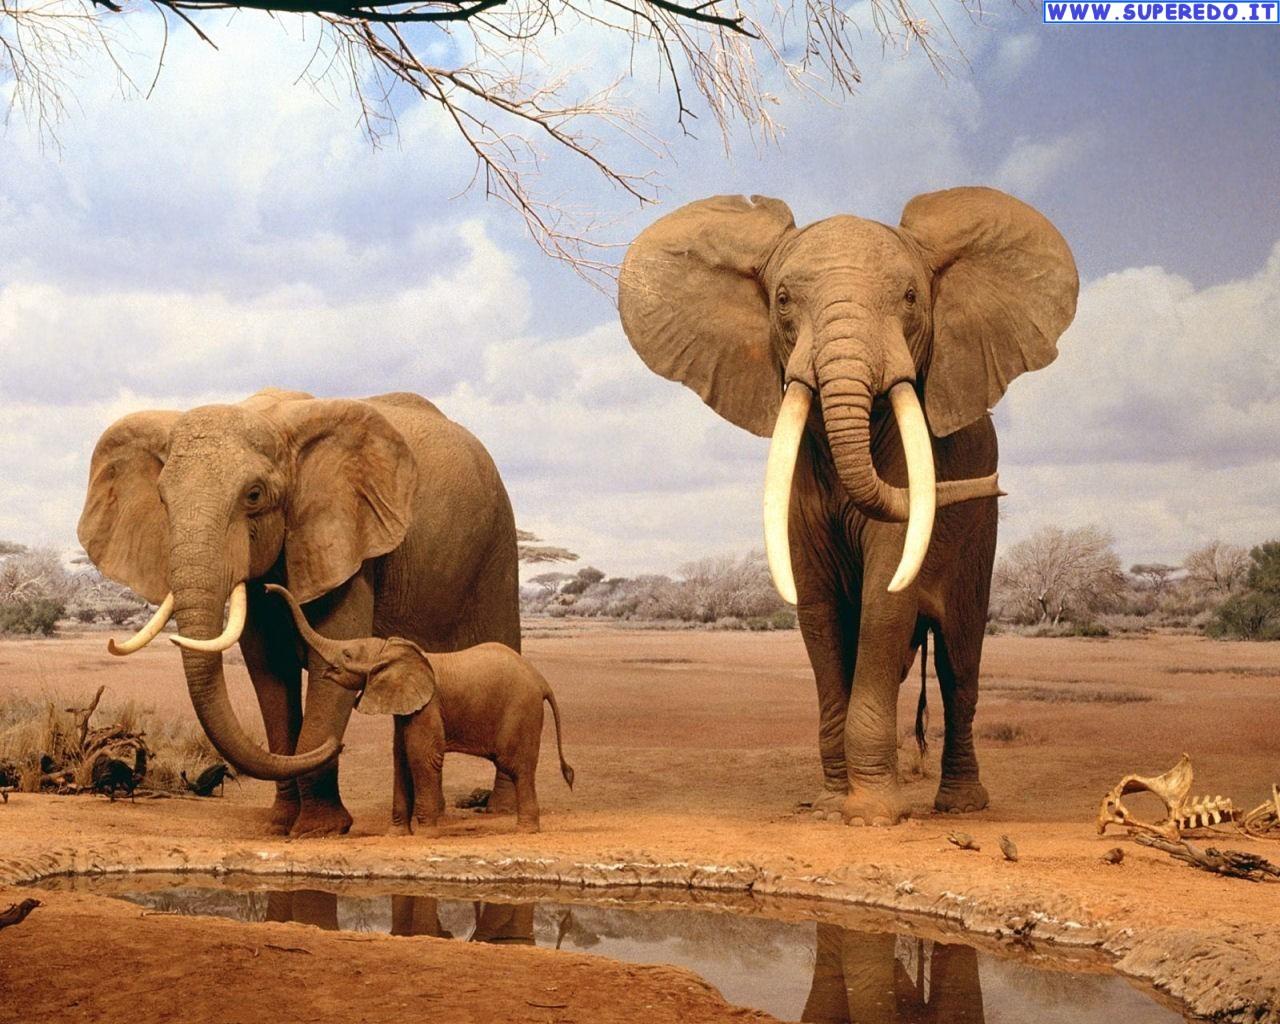 Zimbabwe-è-strage-di-elefanti-ad-ottobre-avvelenati-62-esemplari